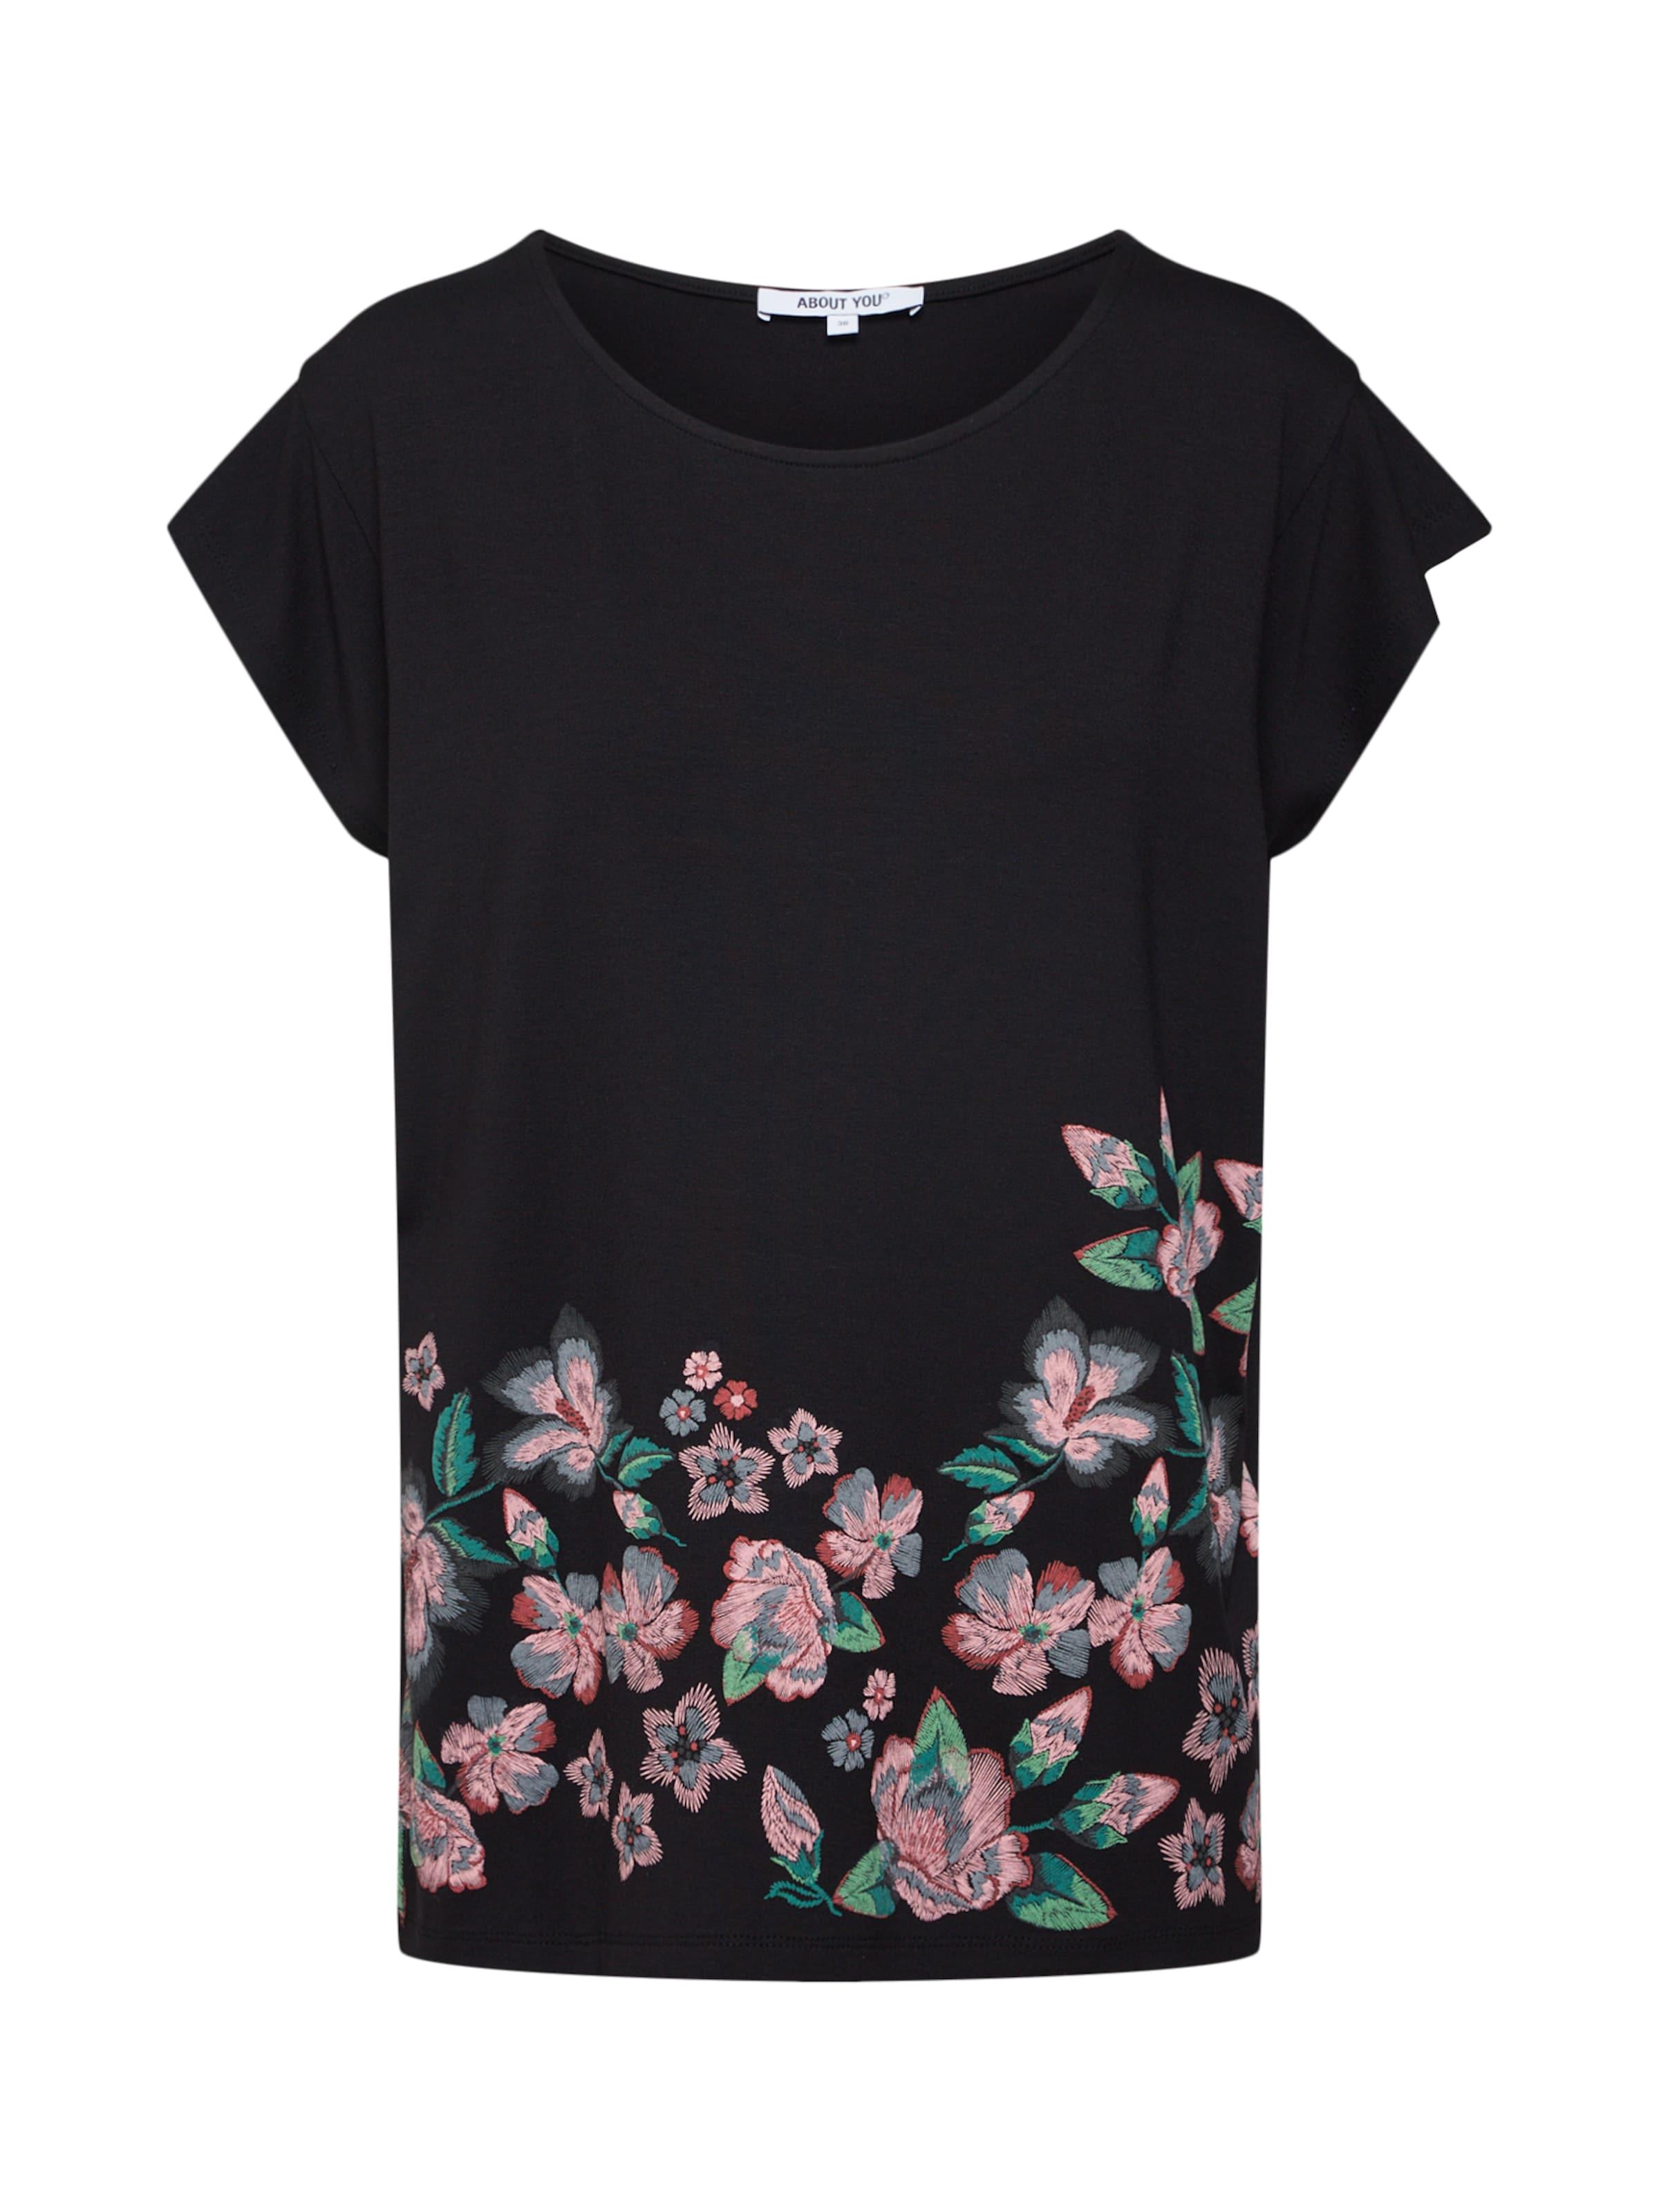 AncienneNoir Rose About You En shirt T 'sabrina' DYeEIWH29b